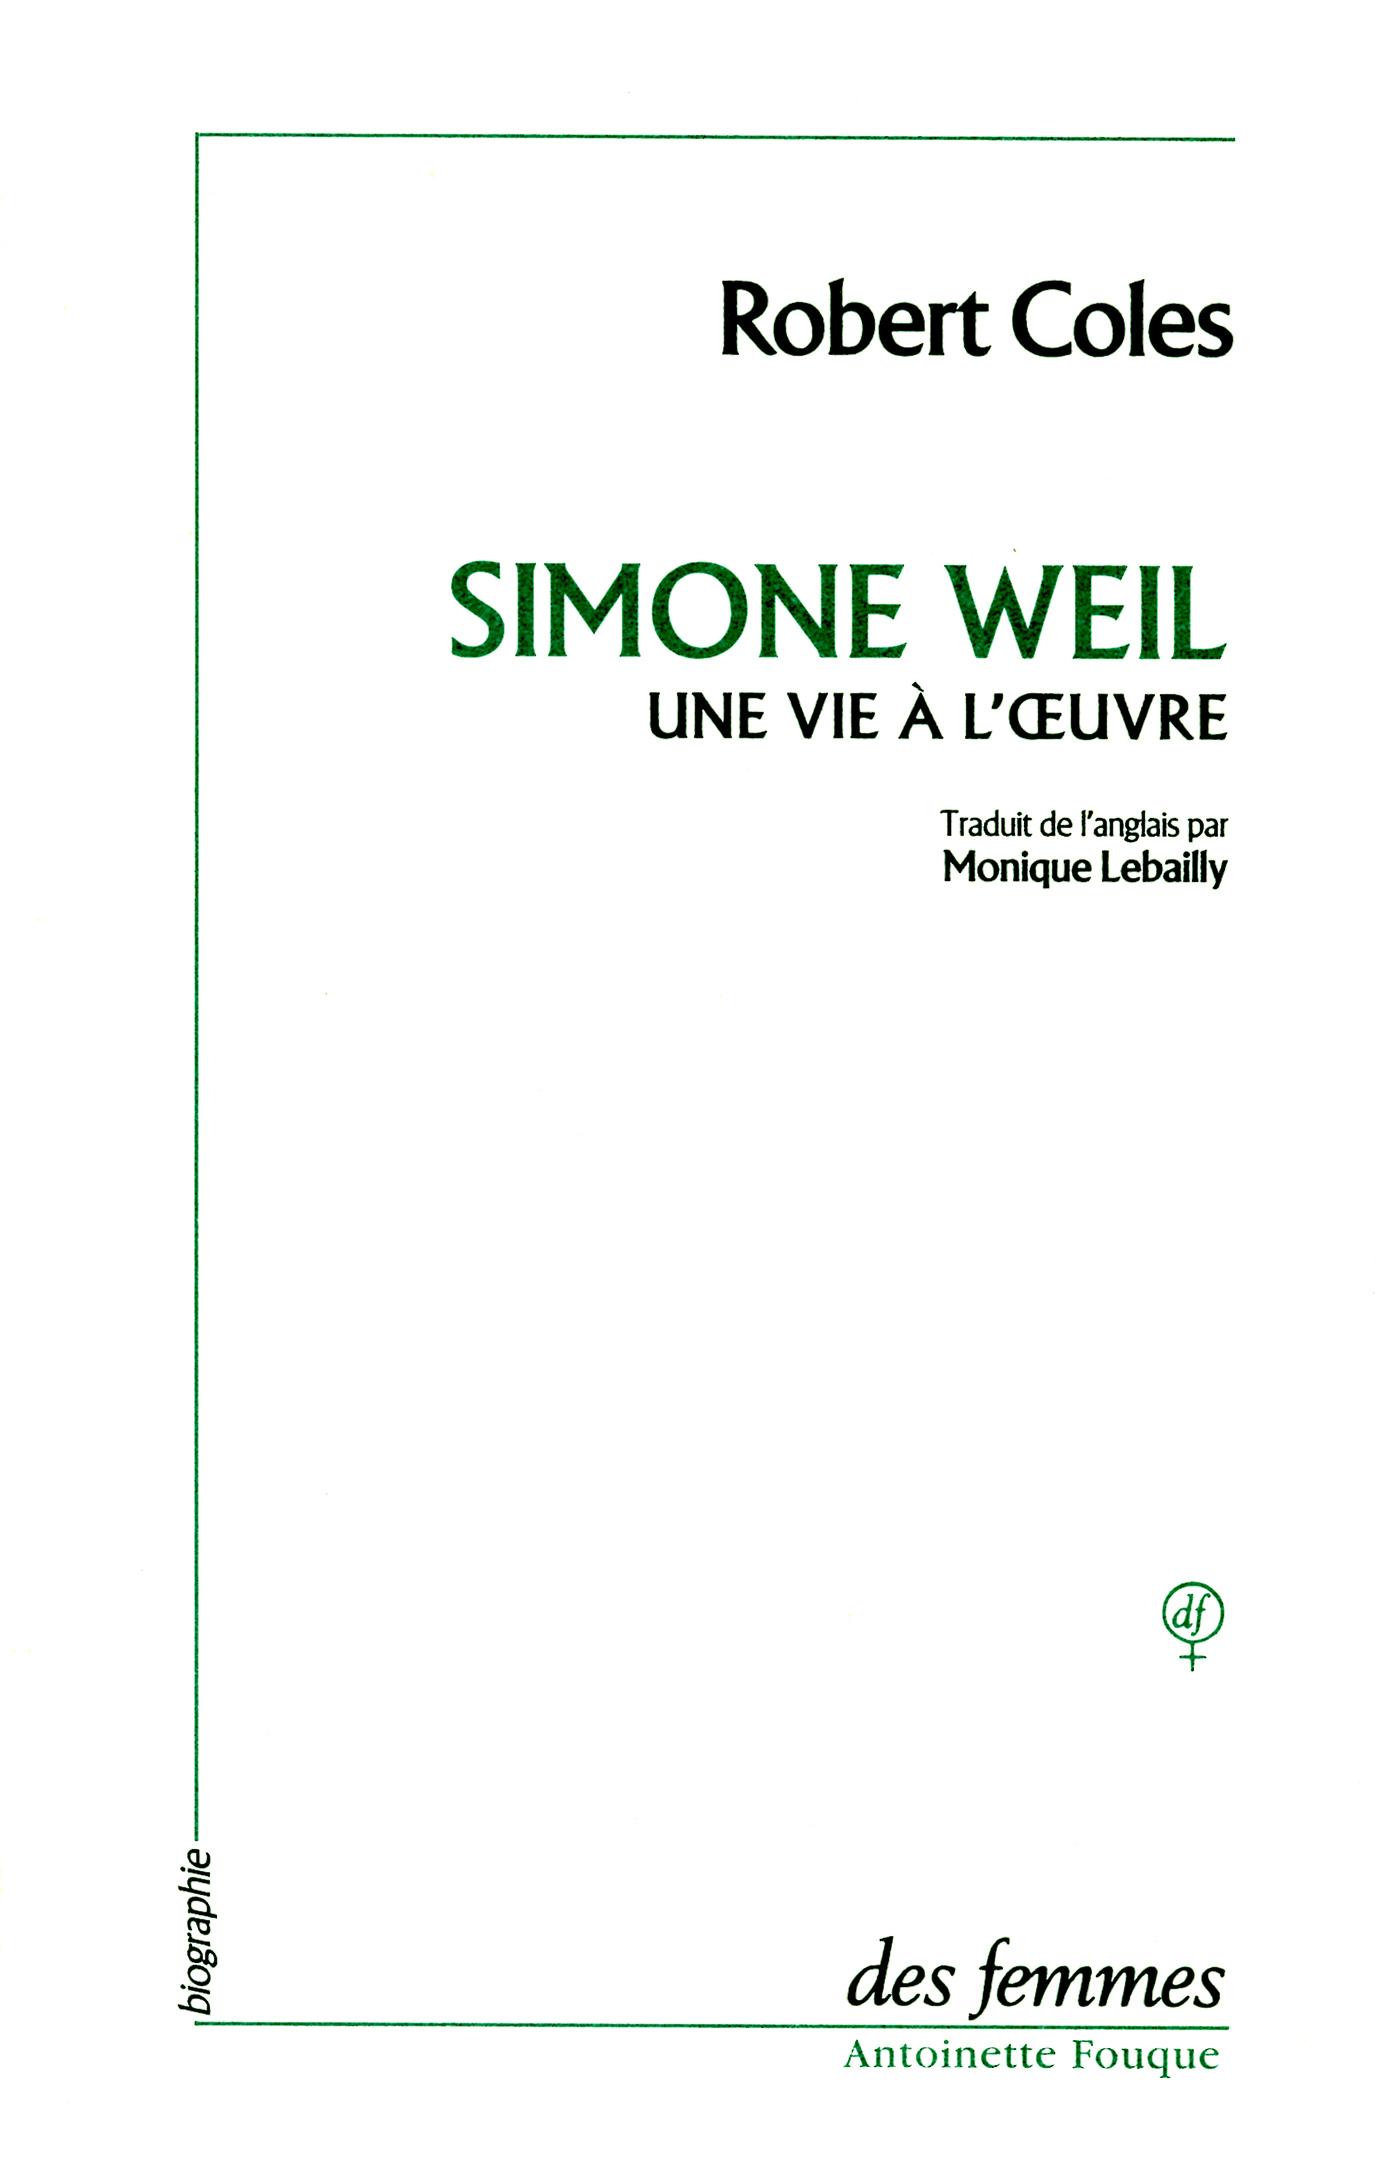 SIMONE WEIL UNE VIE A L'OEUVRE